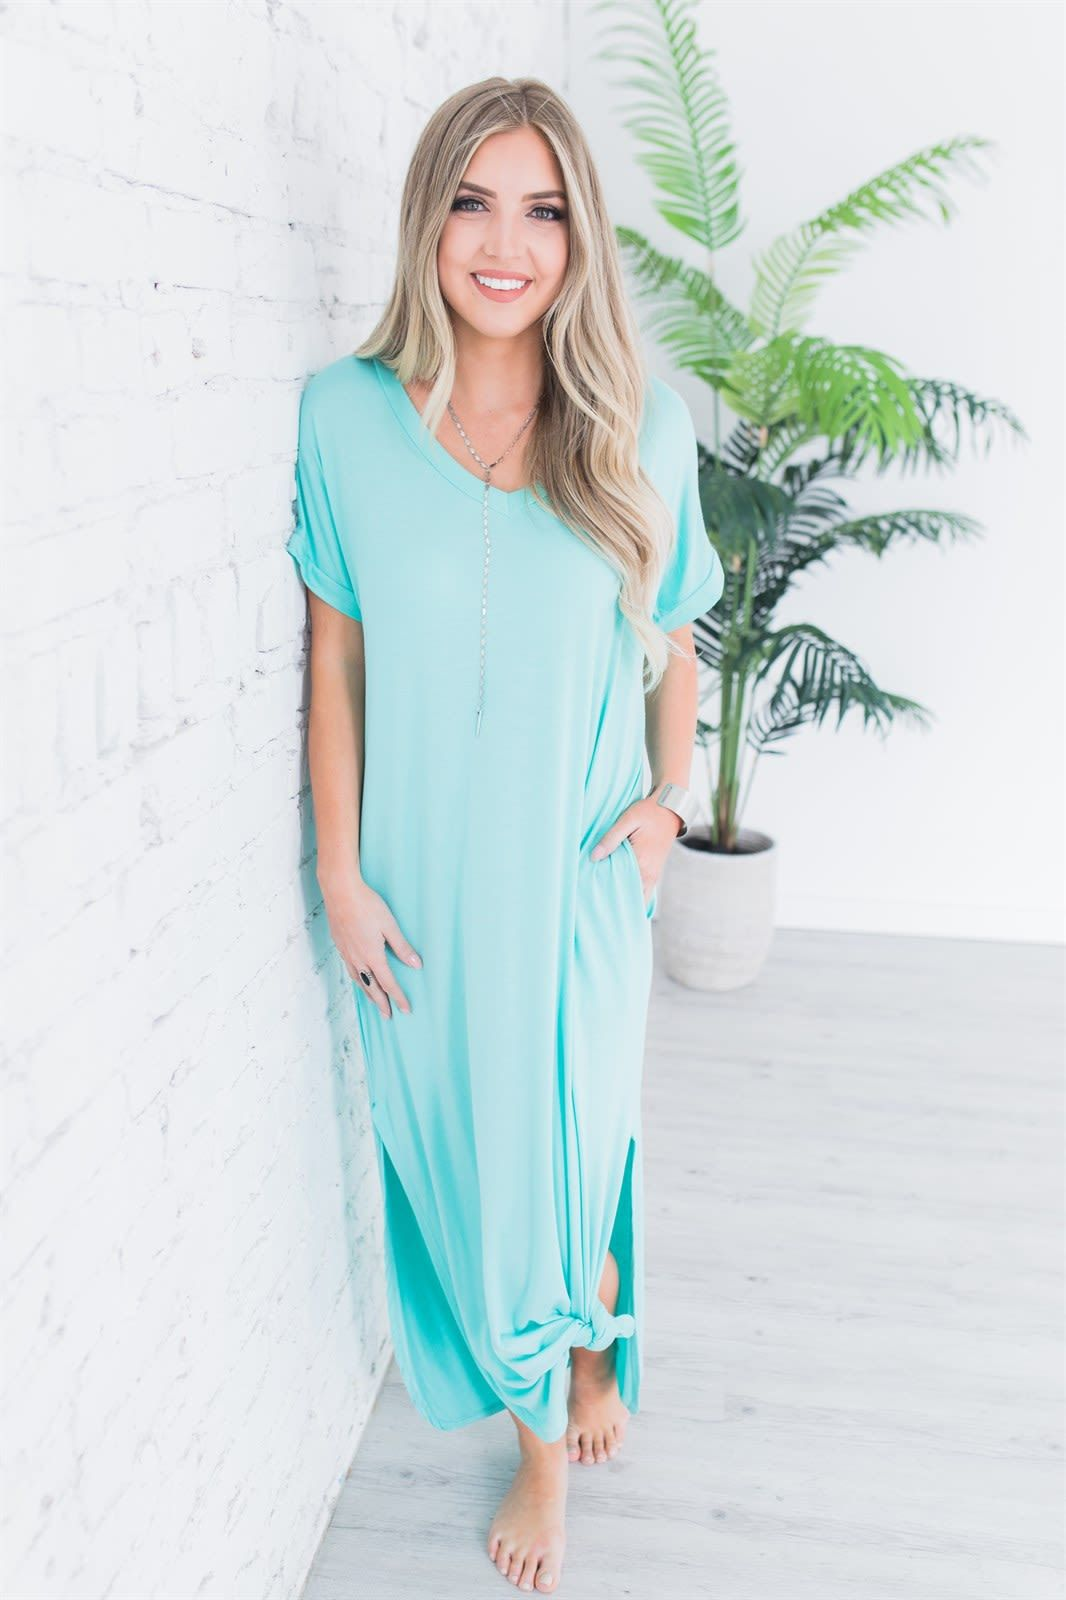 Short Sleeve Maxi W Pockets Maxi Knit Dress Maxi Shirt Dress Dresses [ 1600 x 1066 Pixel ]